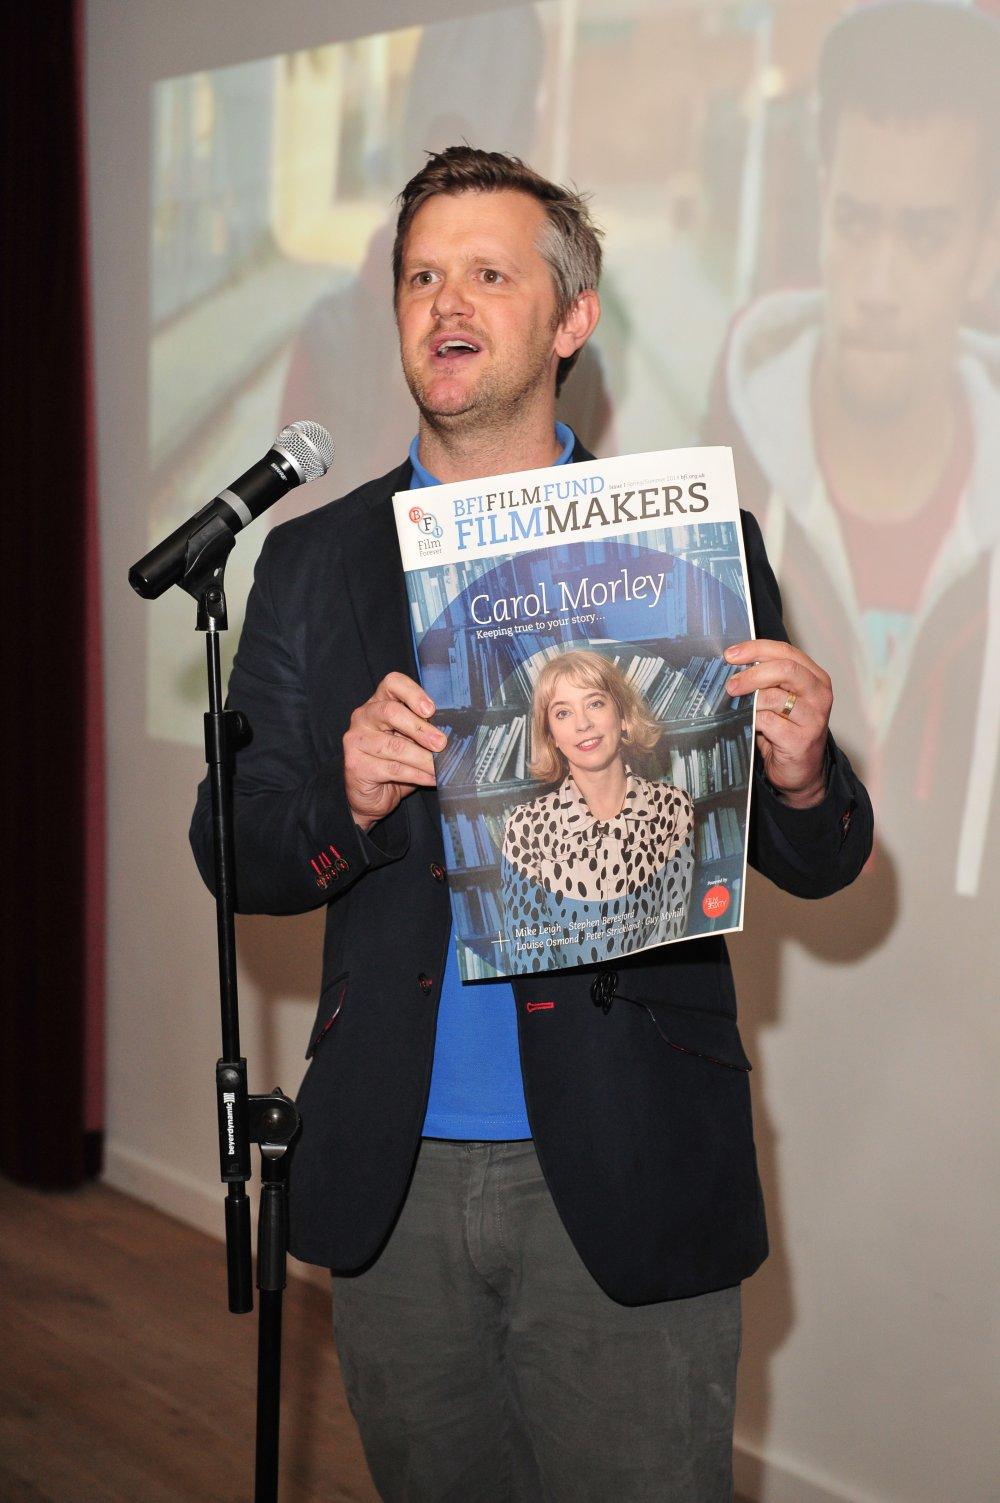 Ben Roberts, Director of the BFI Film Fund